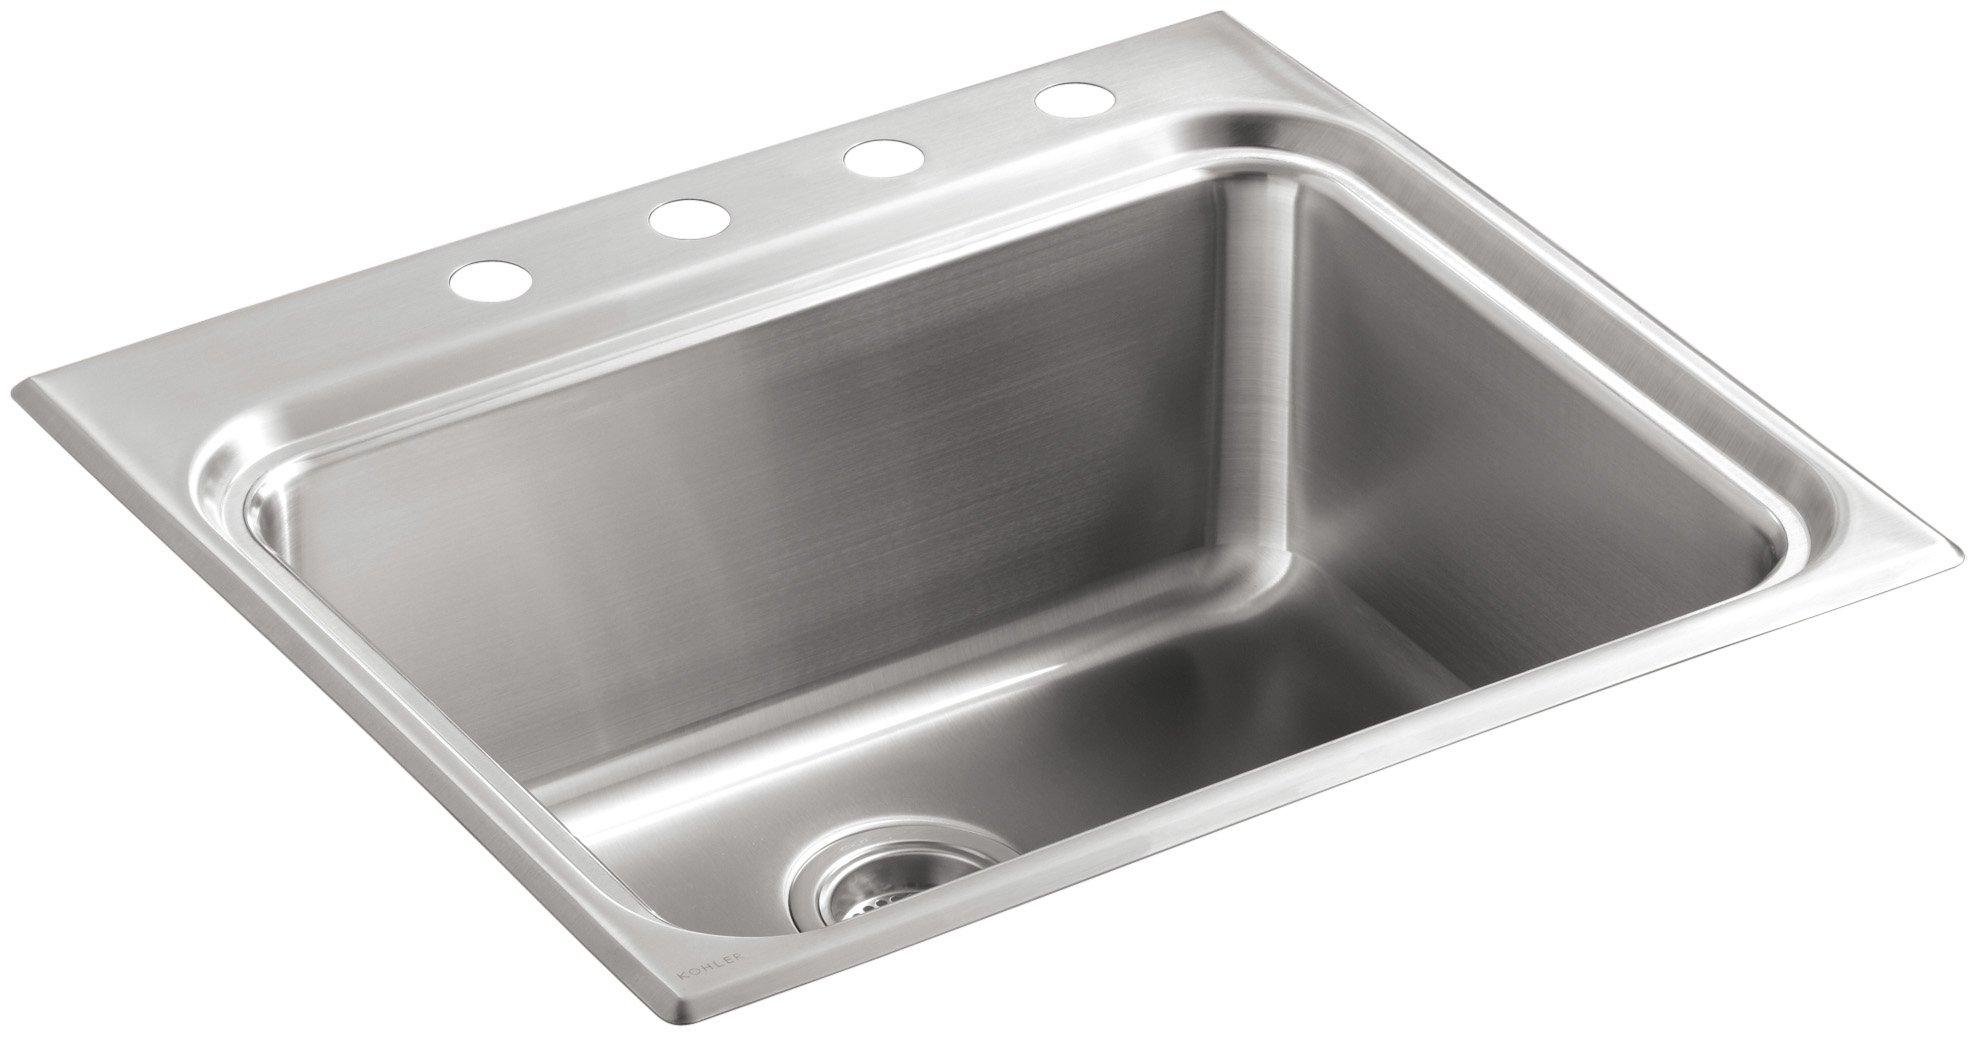 KOHLER K-3206-4-NA Ballad Self-Rimming Utility Sink